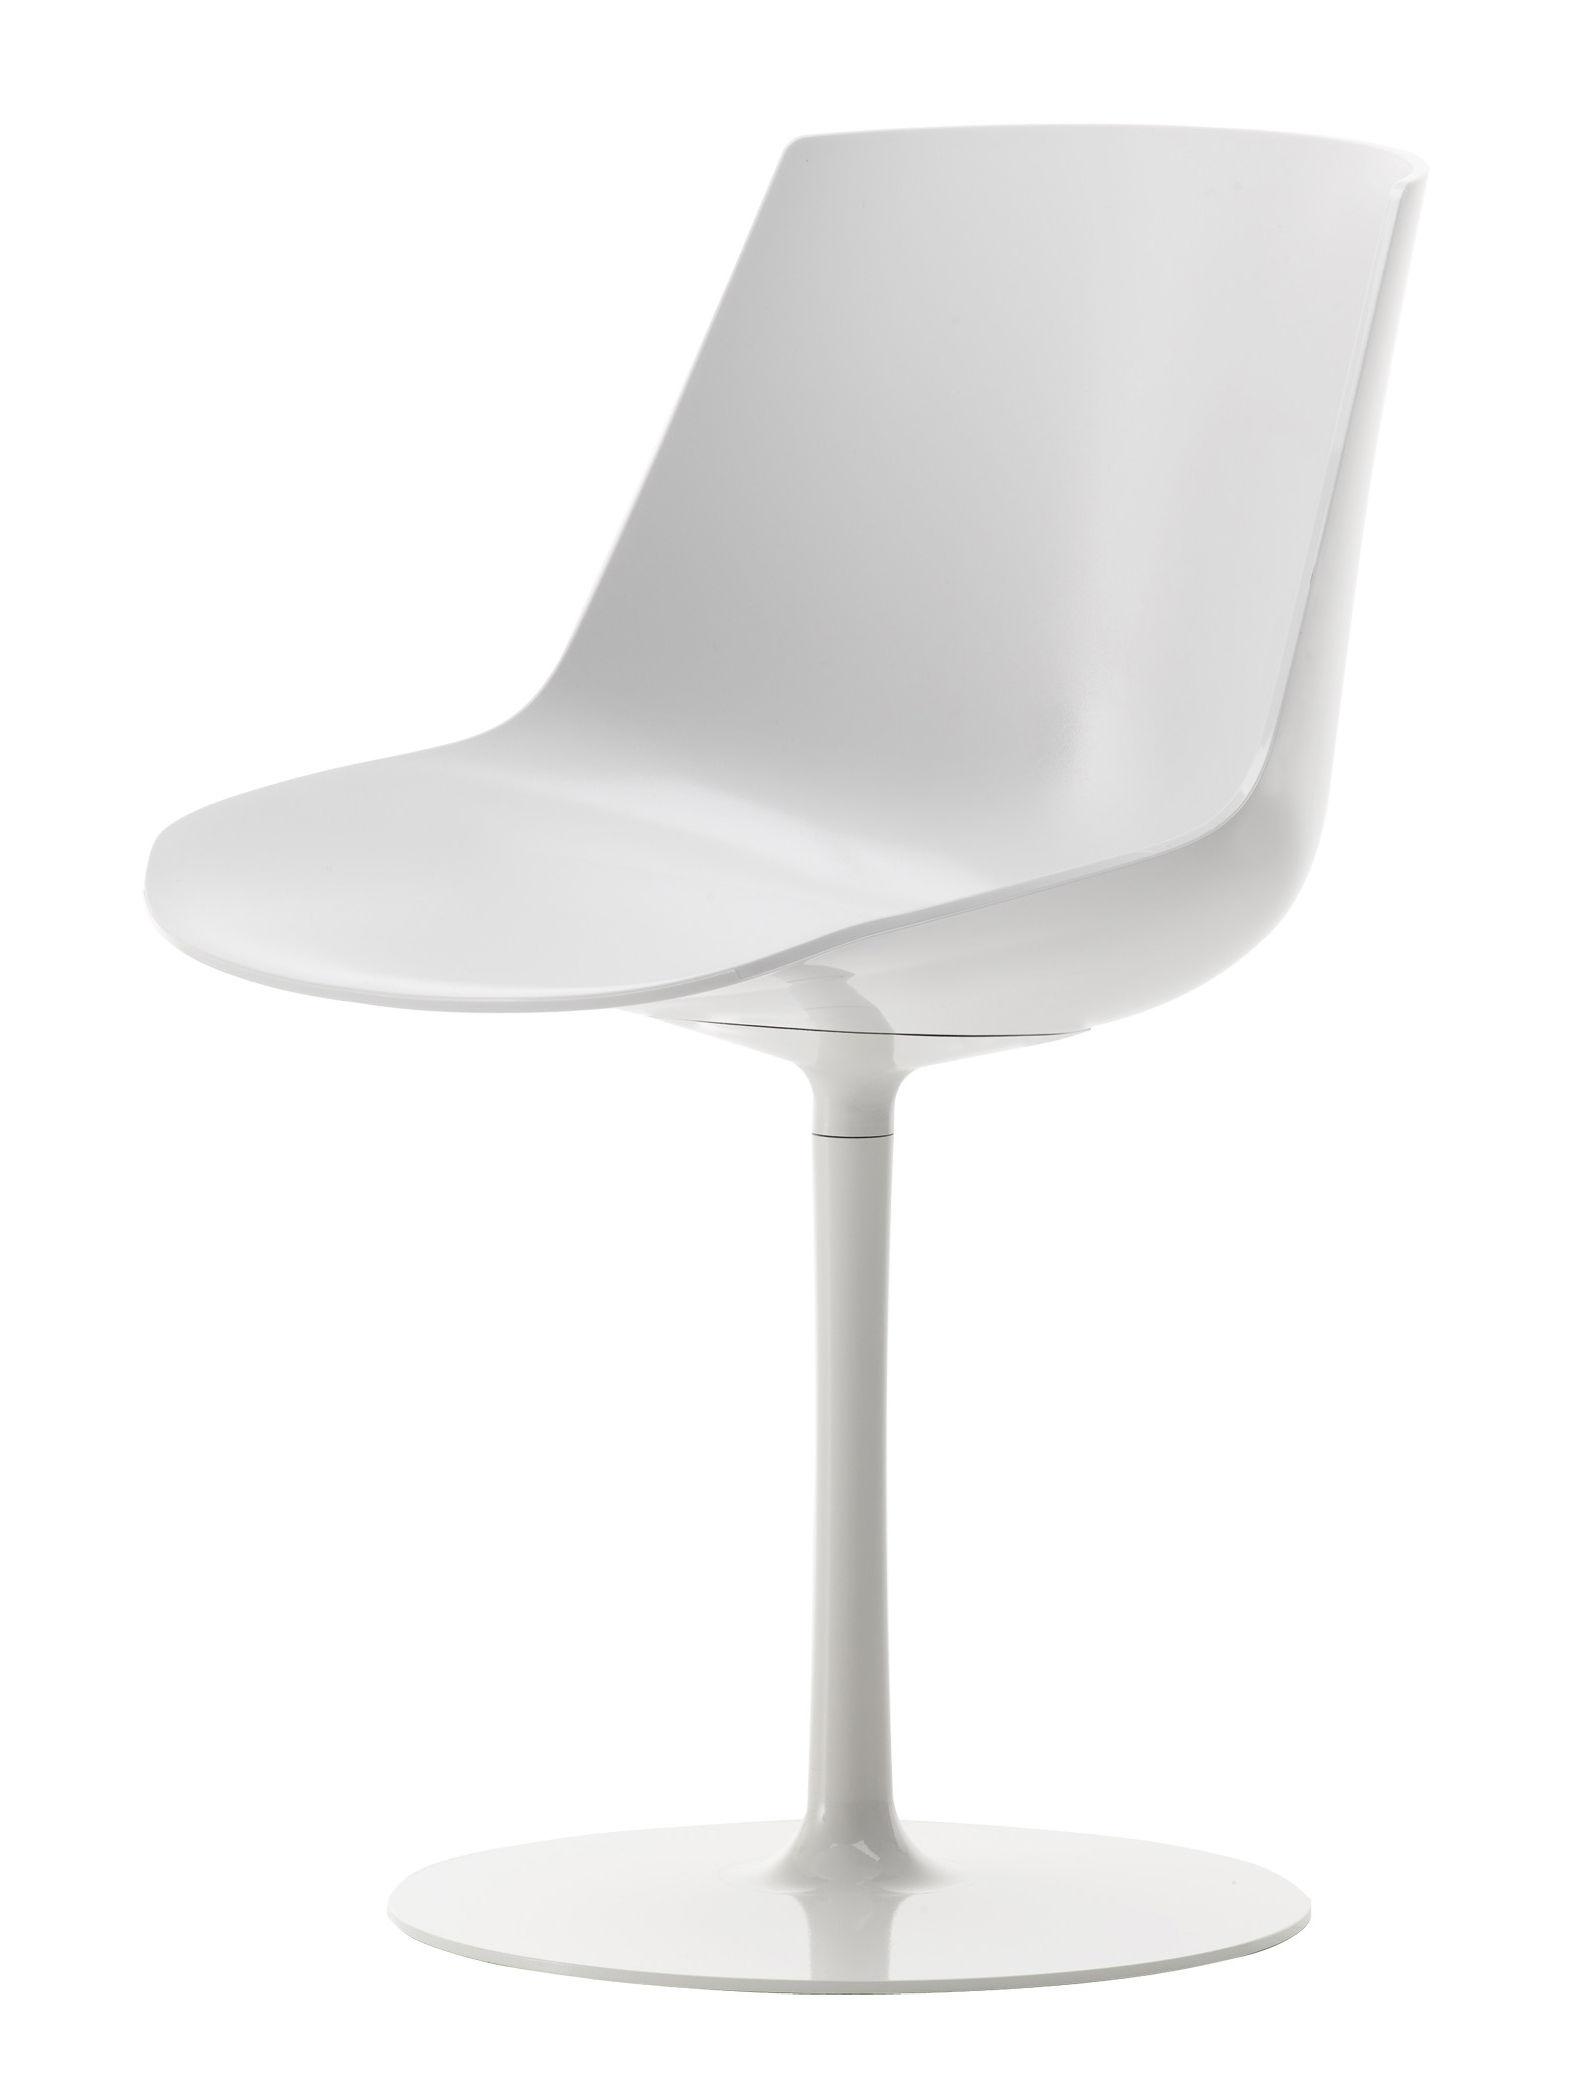 chaise pivotante flow pied central blanc brillant mdf. Black Bedroom Furniture Sets. Home Design Ideas